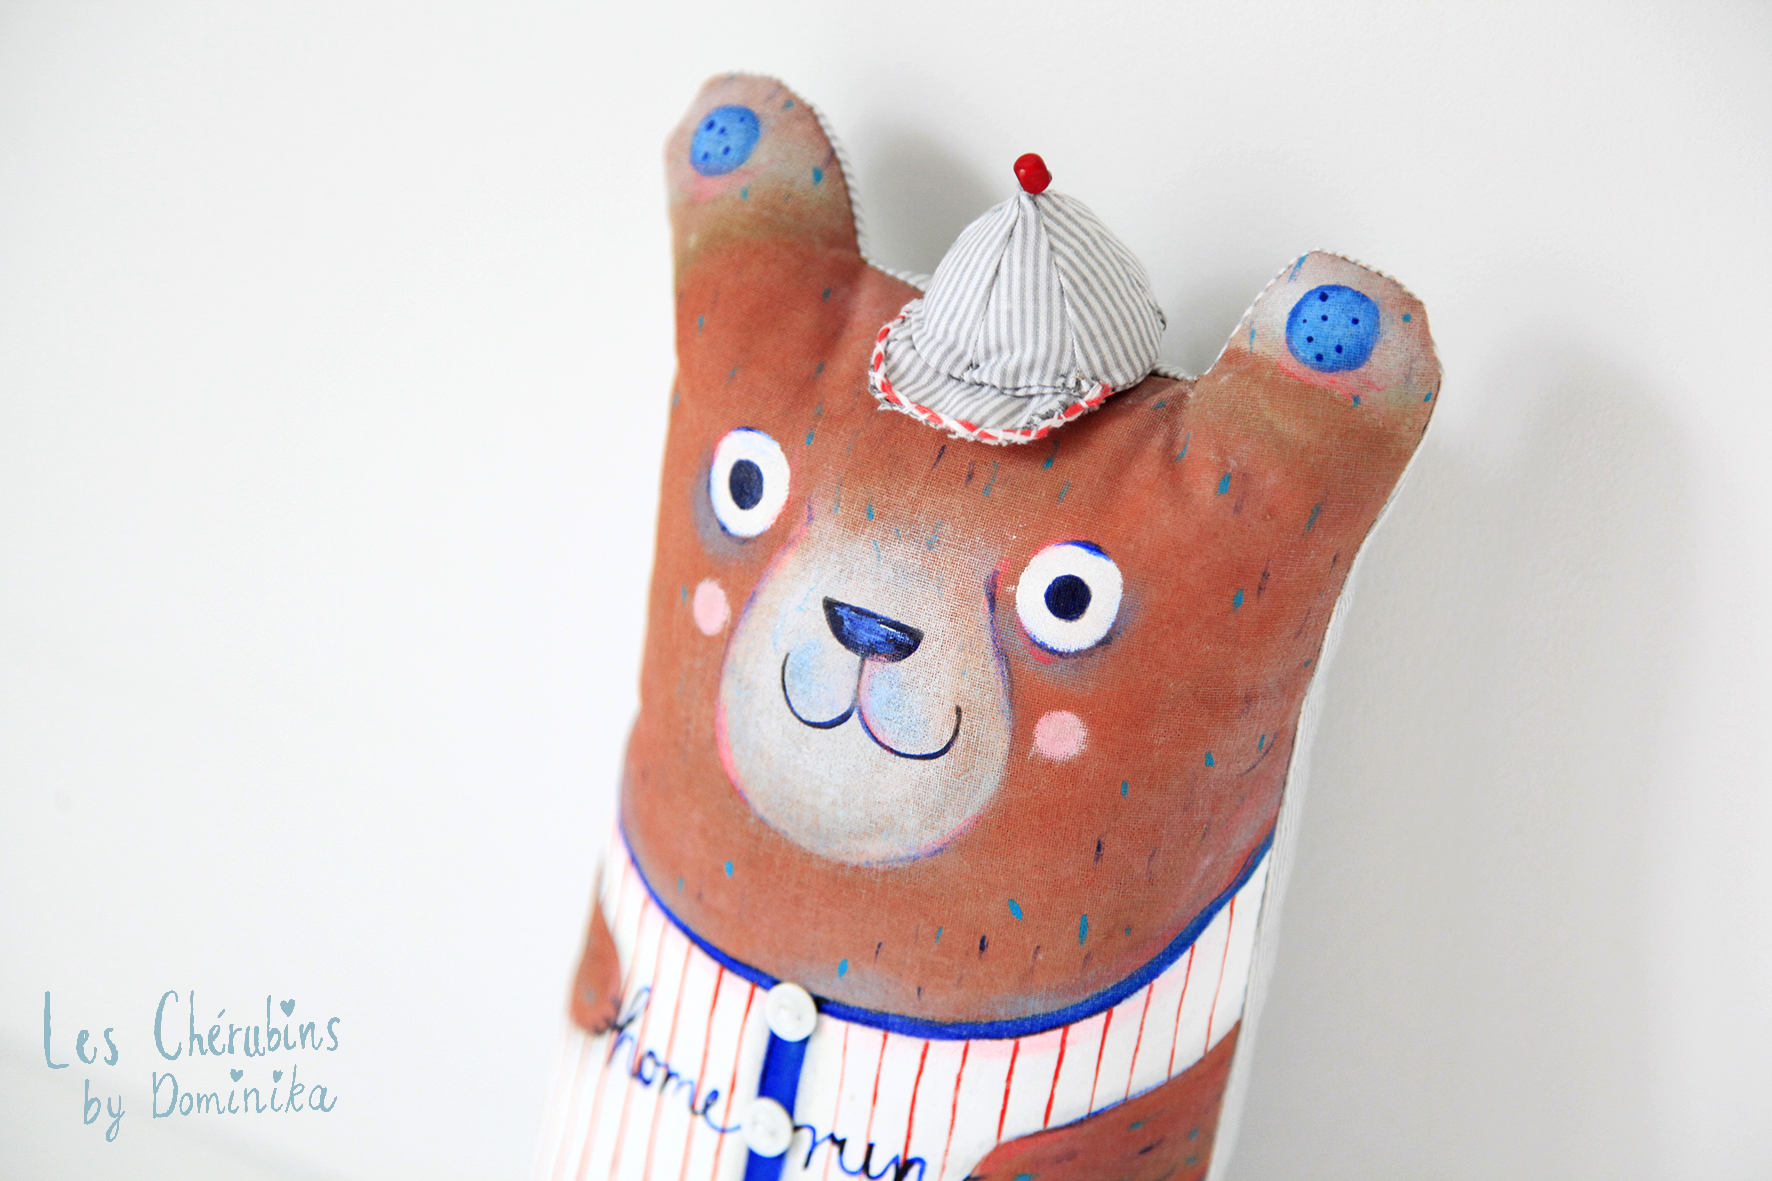 bear_rony_lc_2.jpg